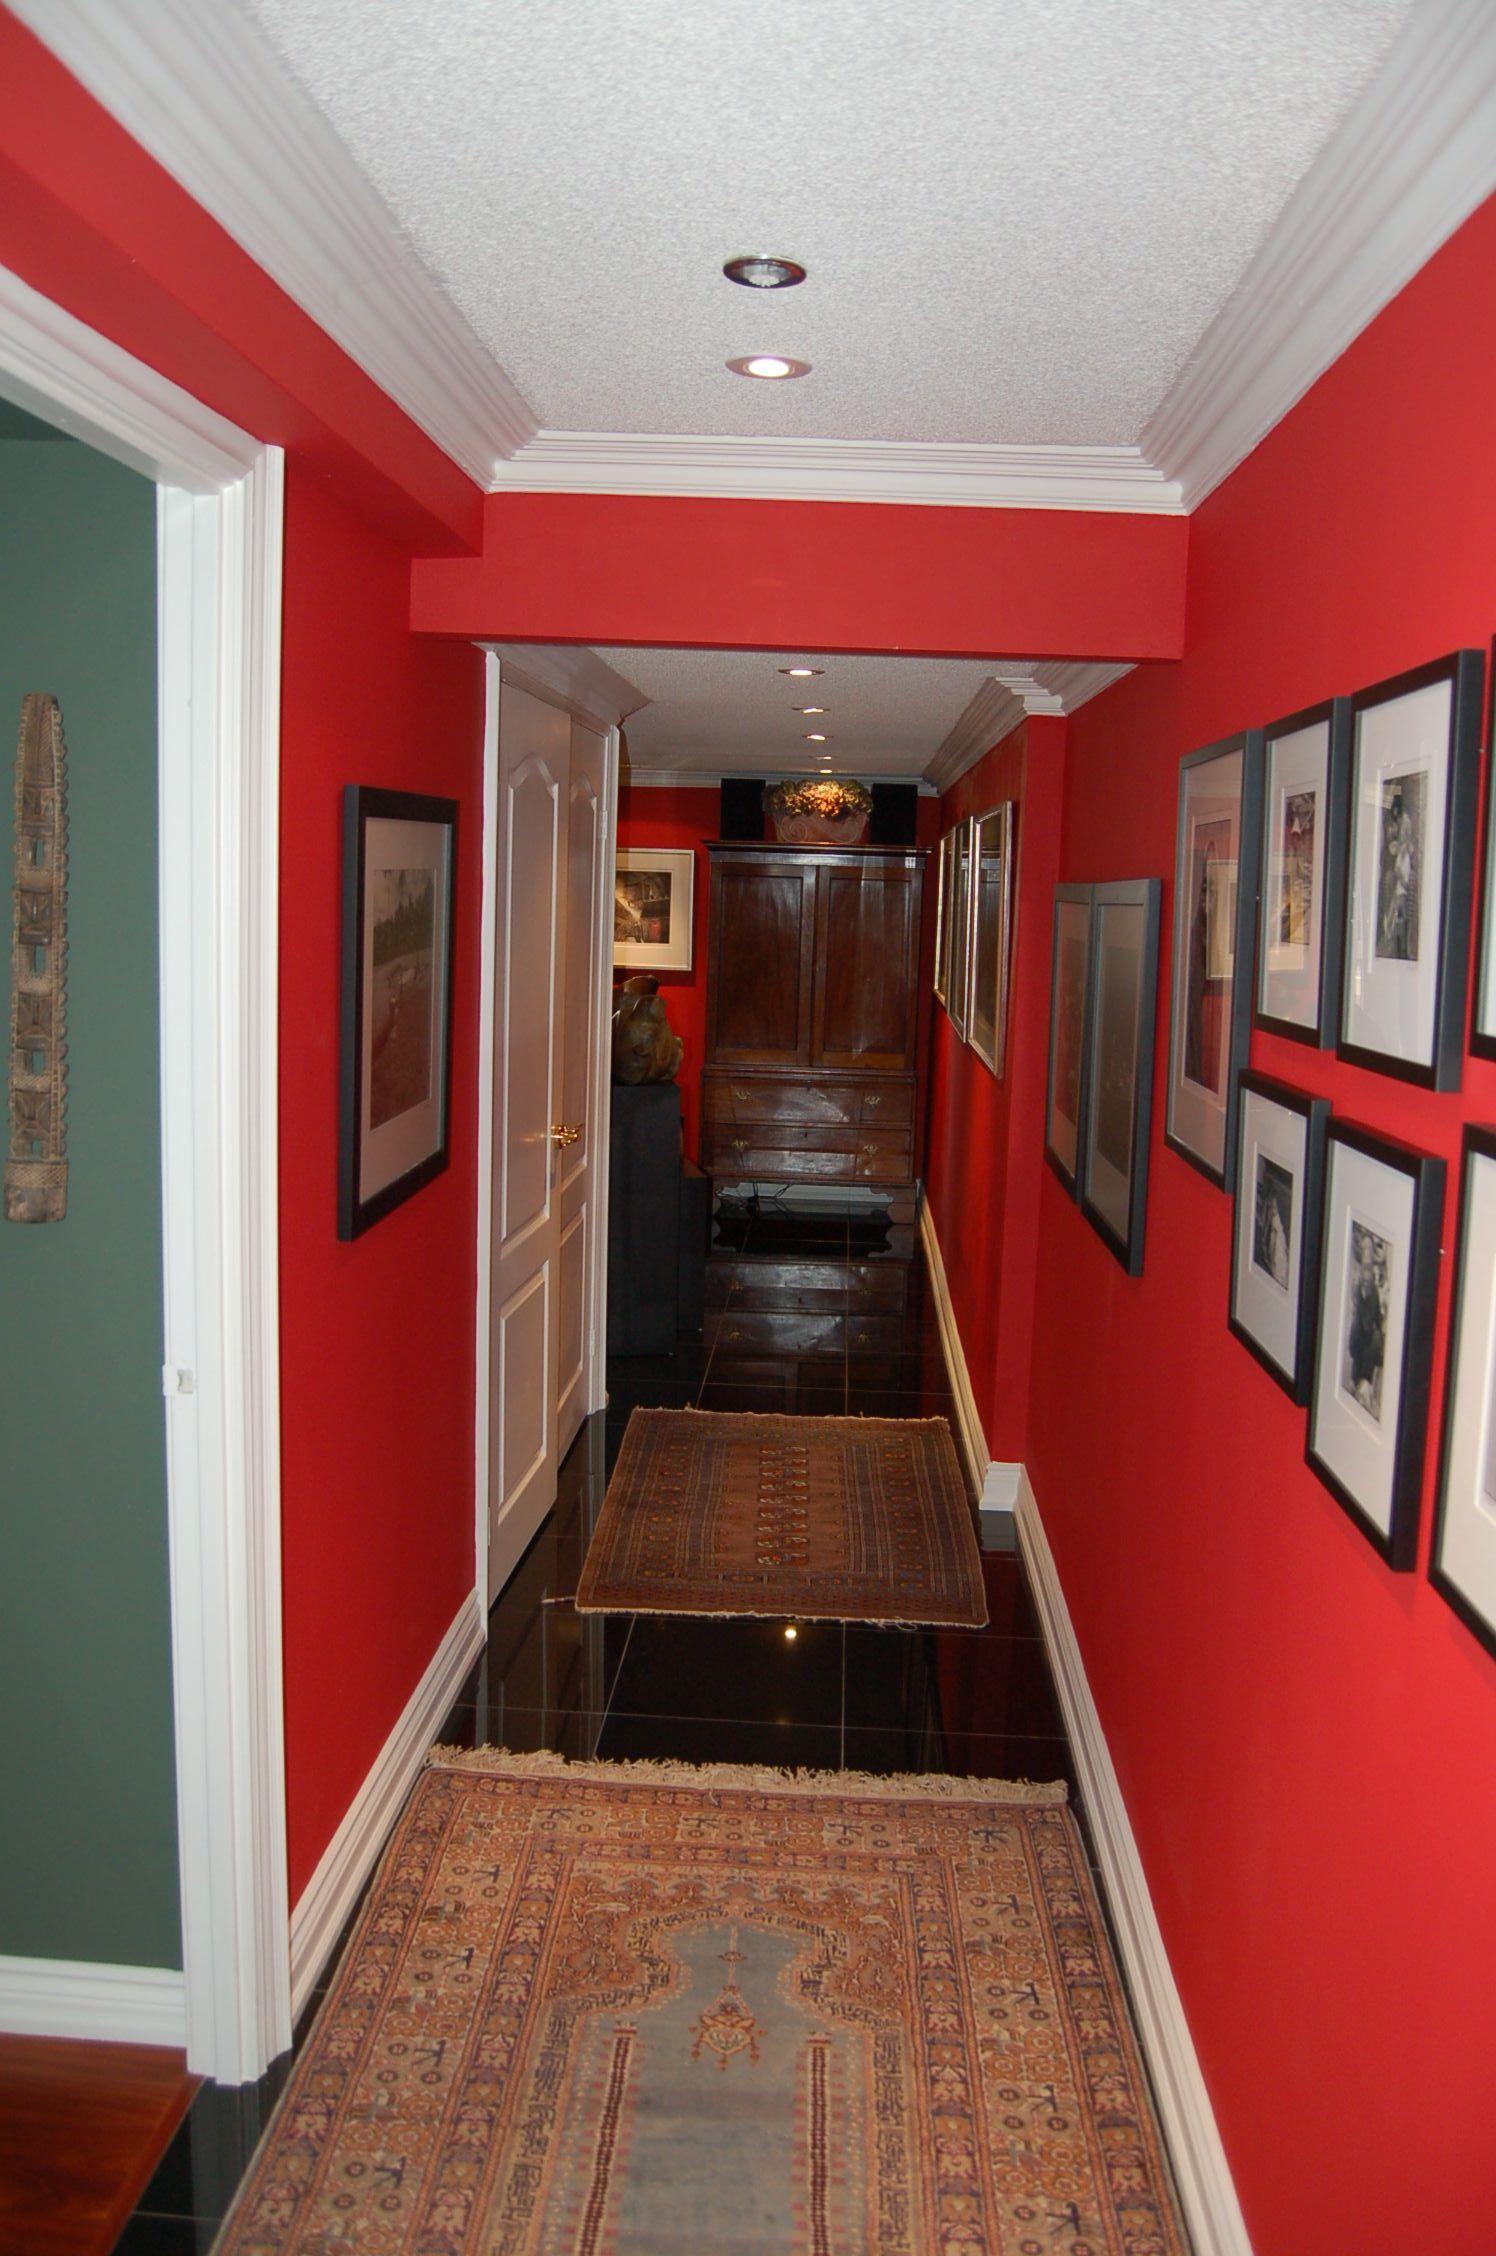 Decoration A Vibrant Hallway Discover Your Taste On Paint Colors